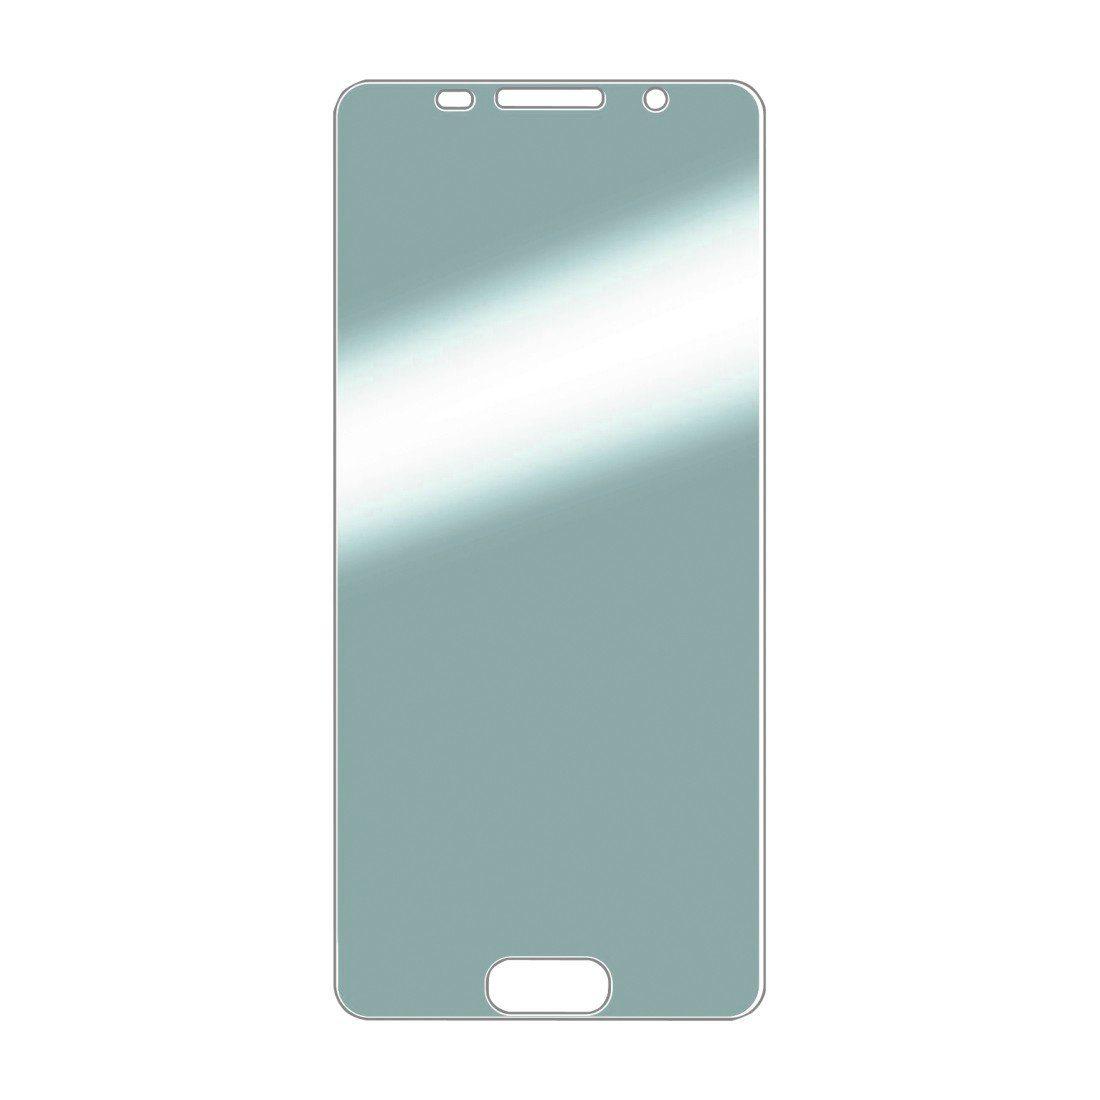 Hama Display-Schutzfolie Crystal Clear für Samsung Galaxy A3 (2016)